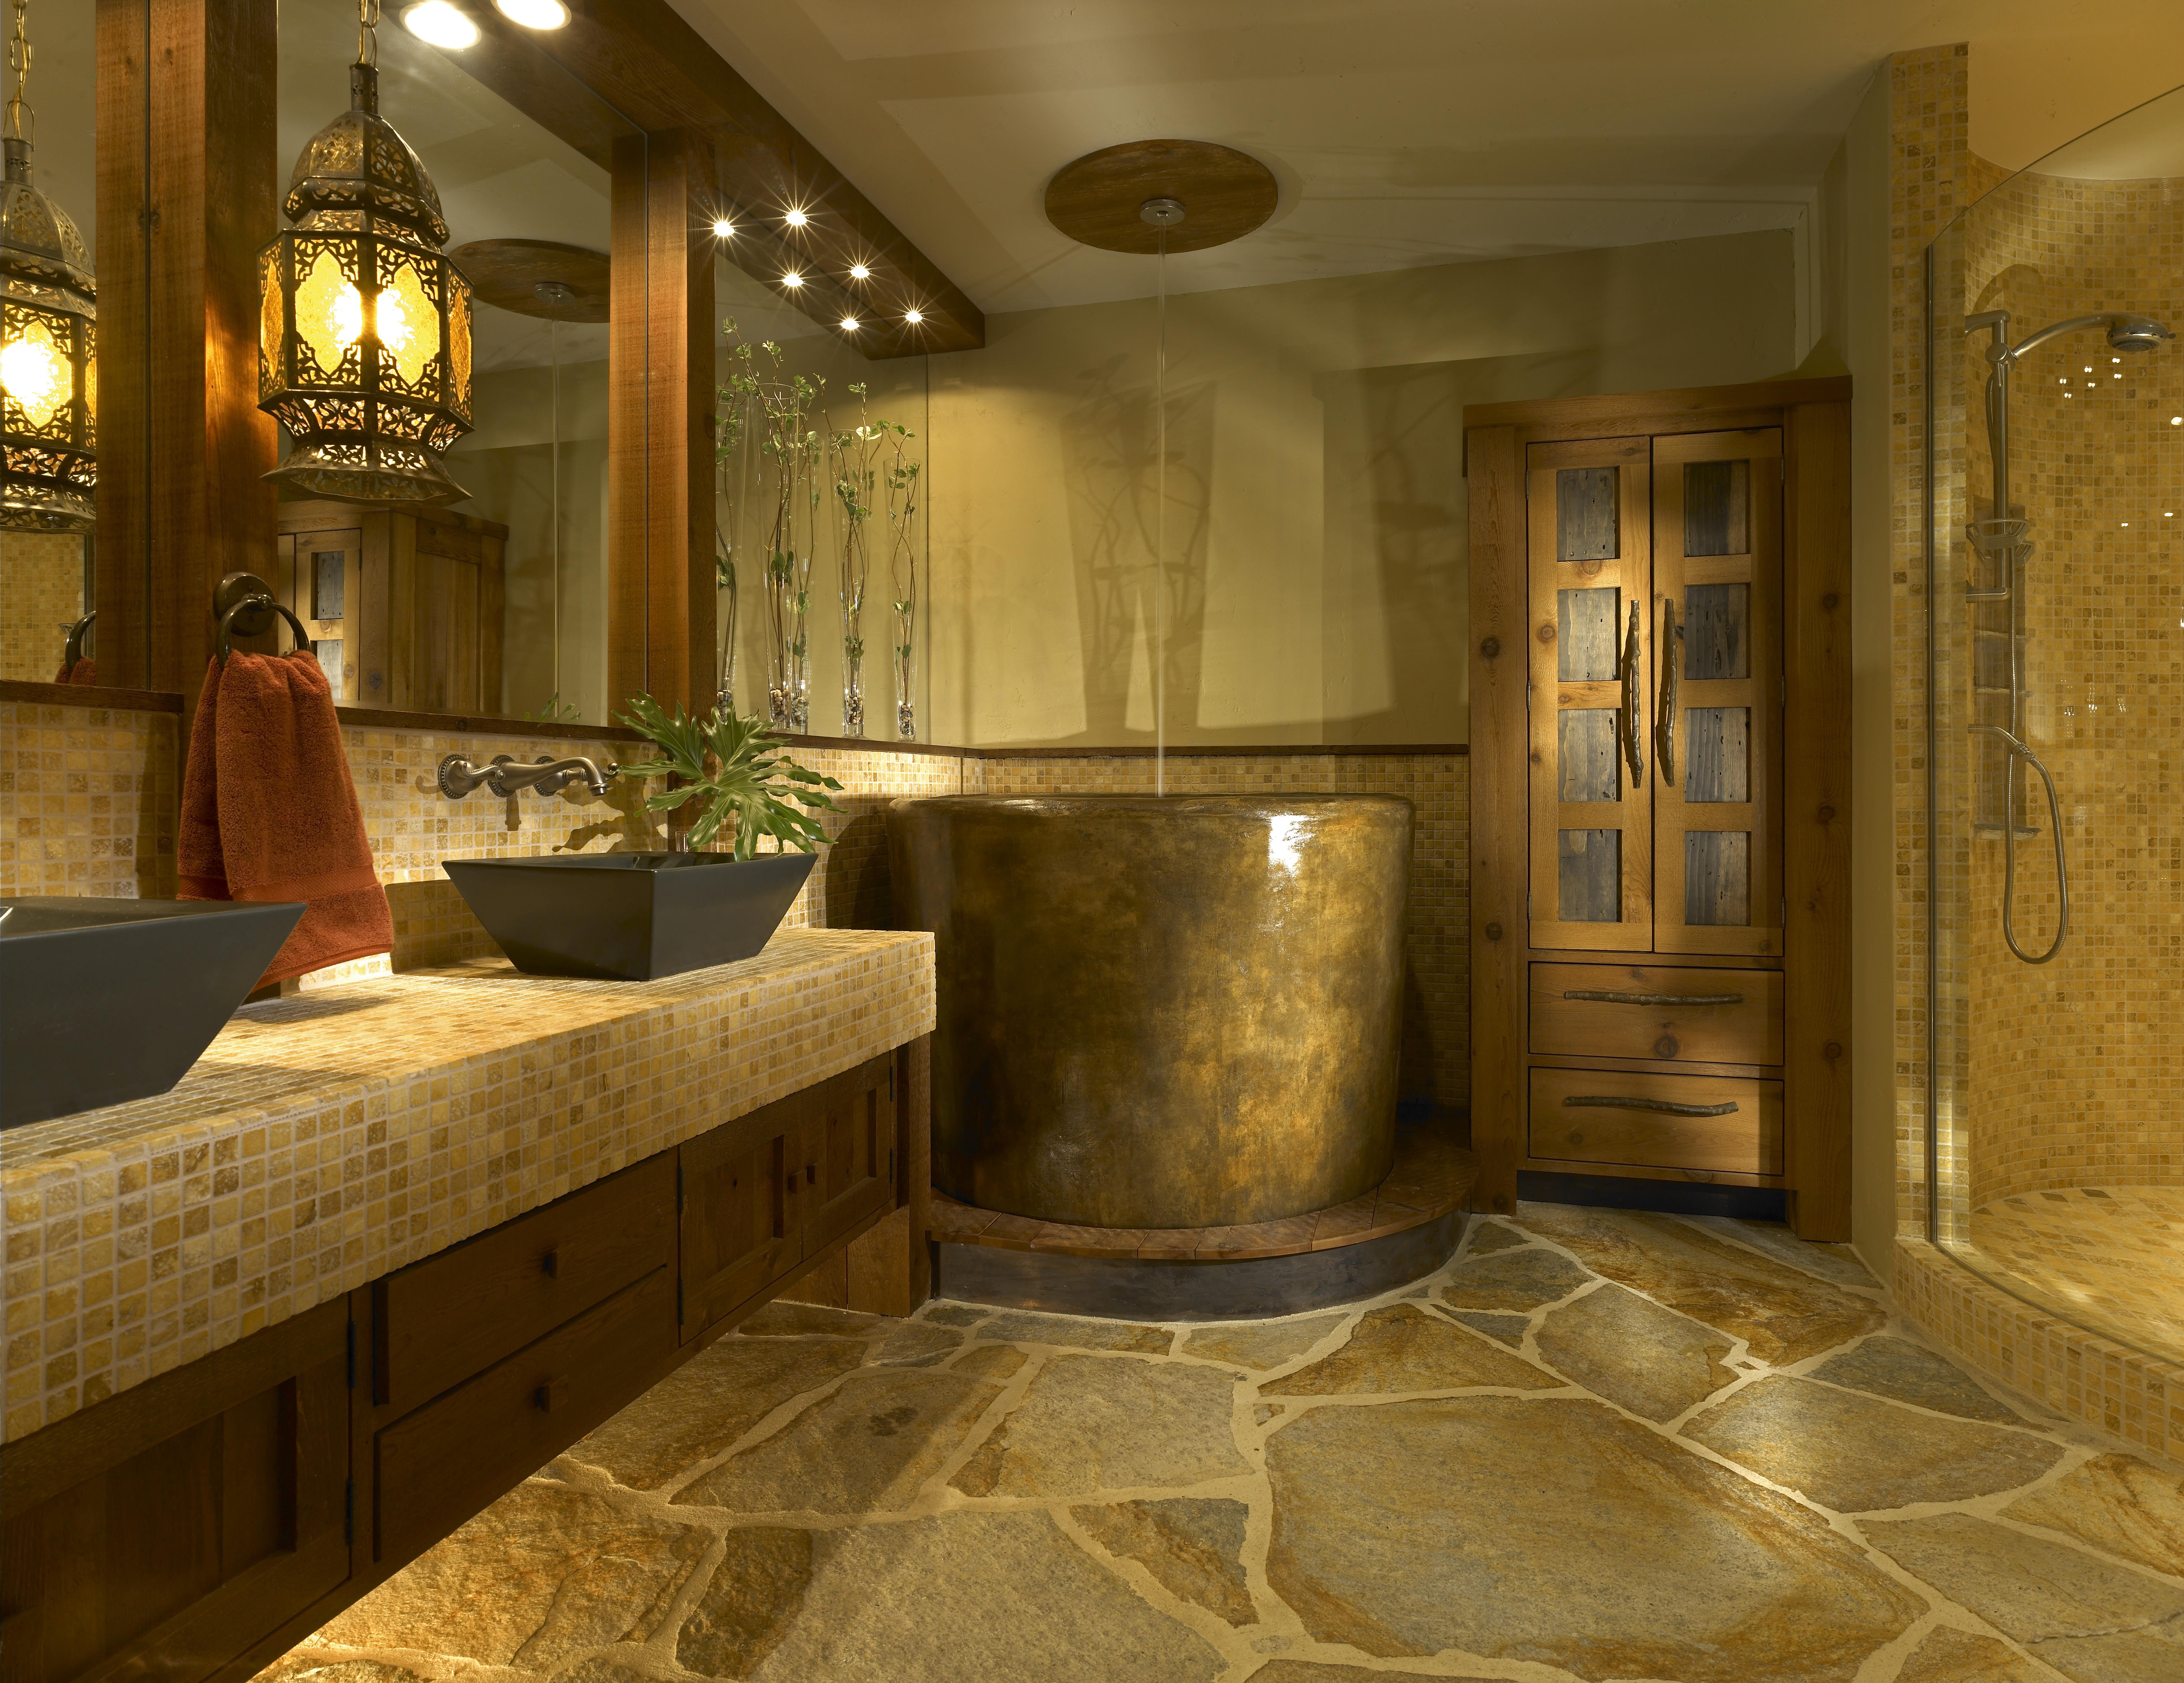 Bathroom cabinet ideas for small bathroom Photo - 1